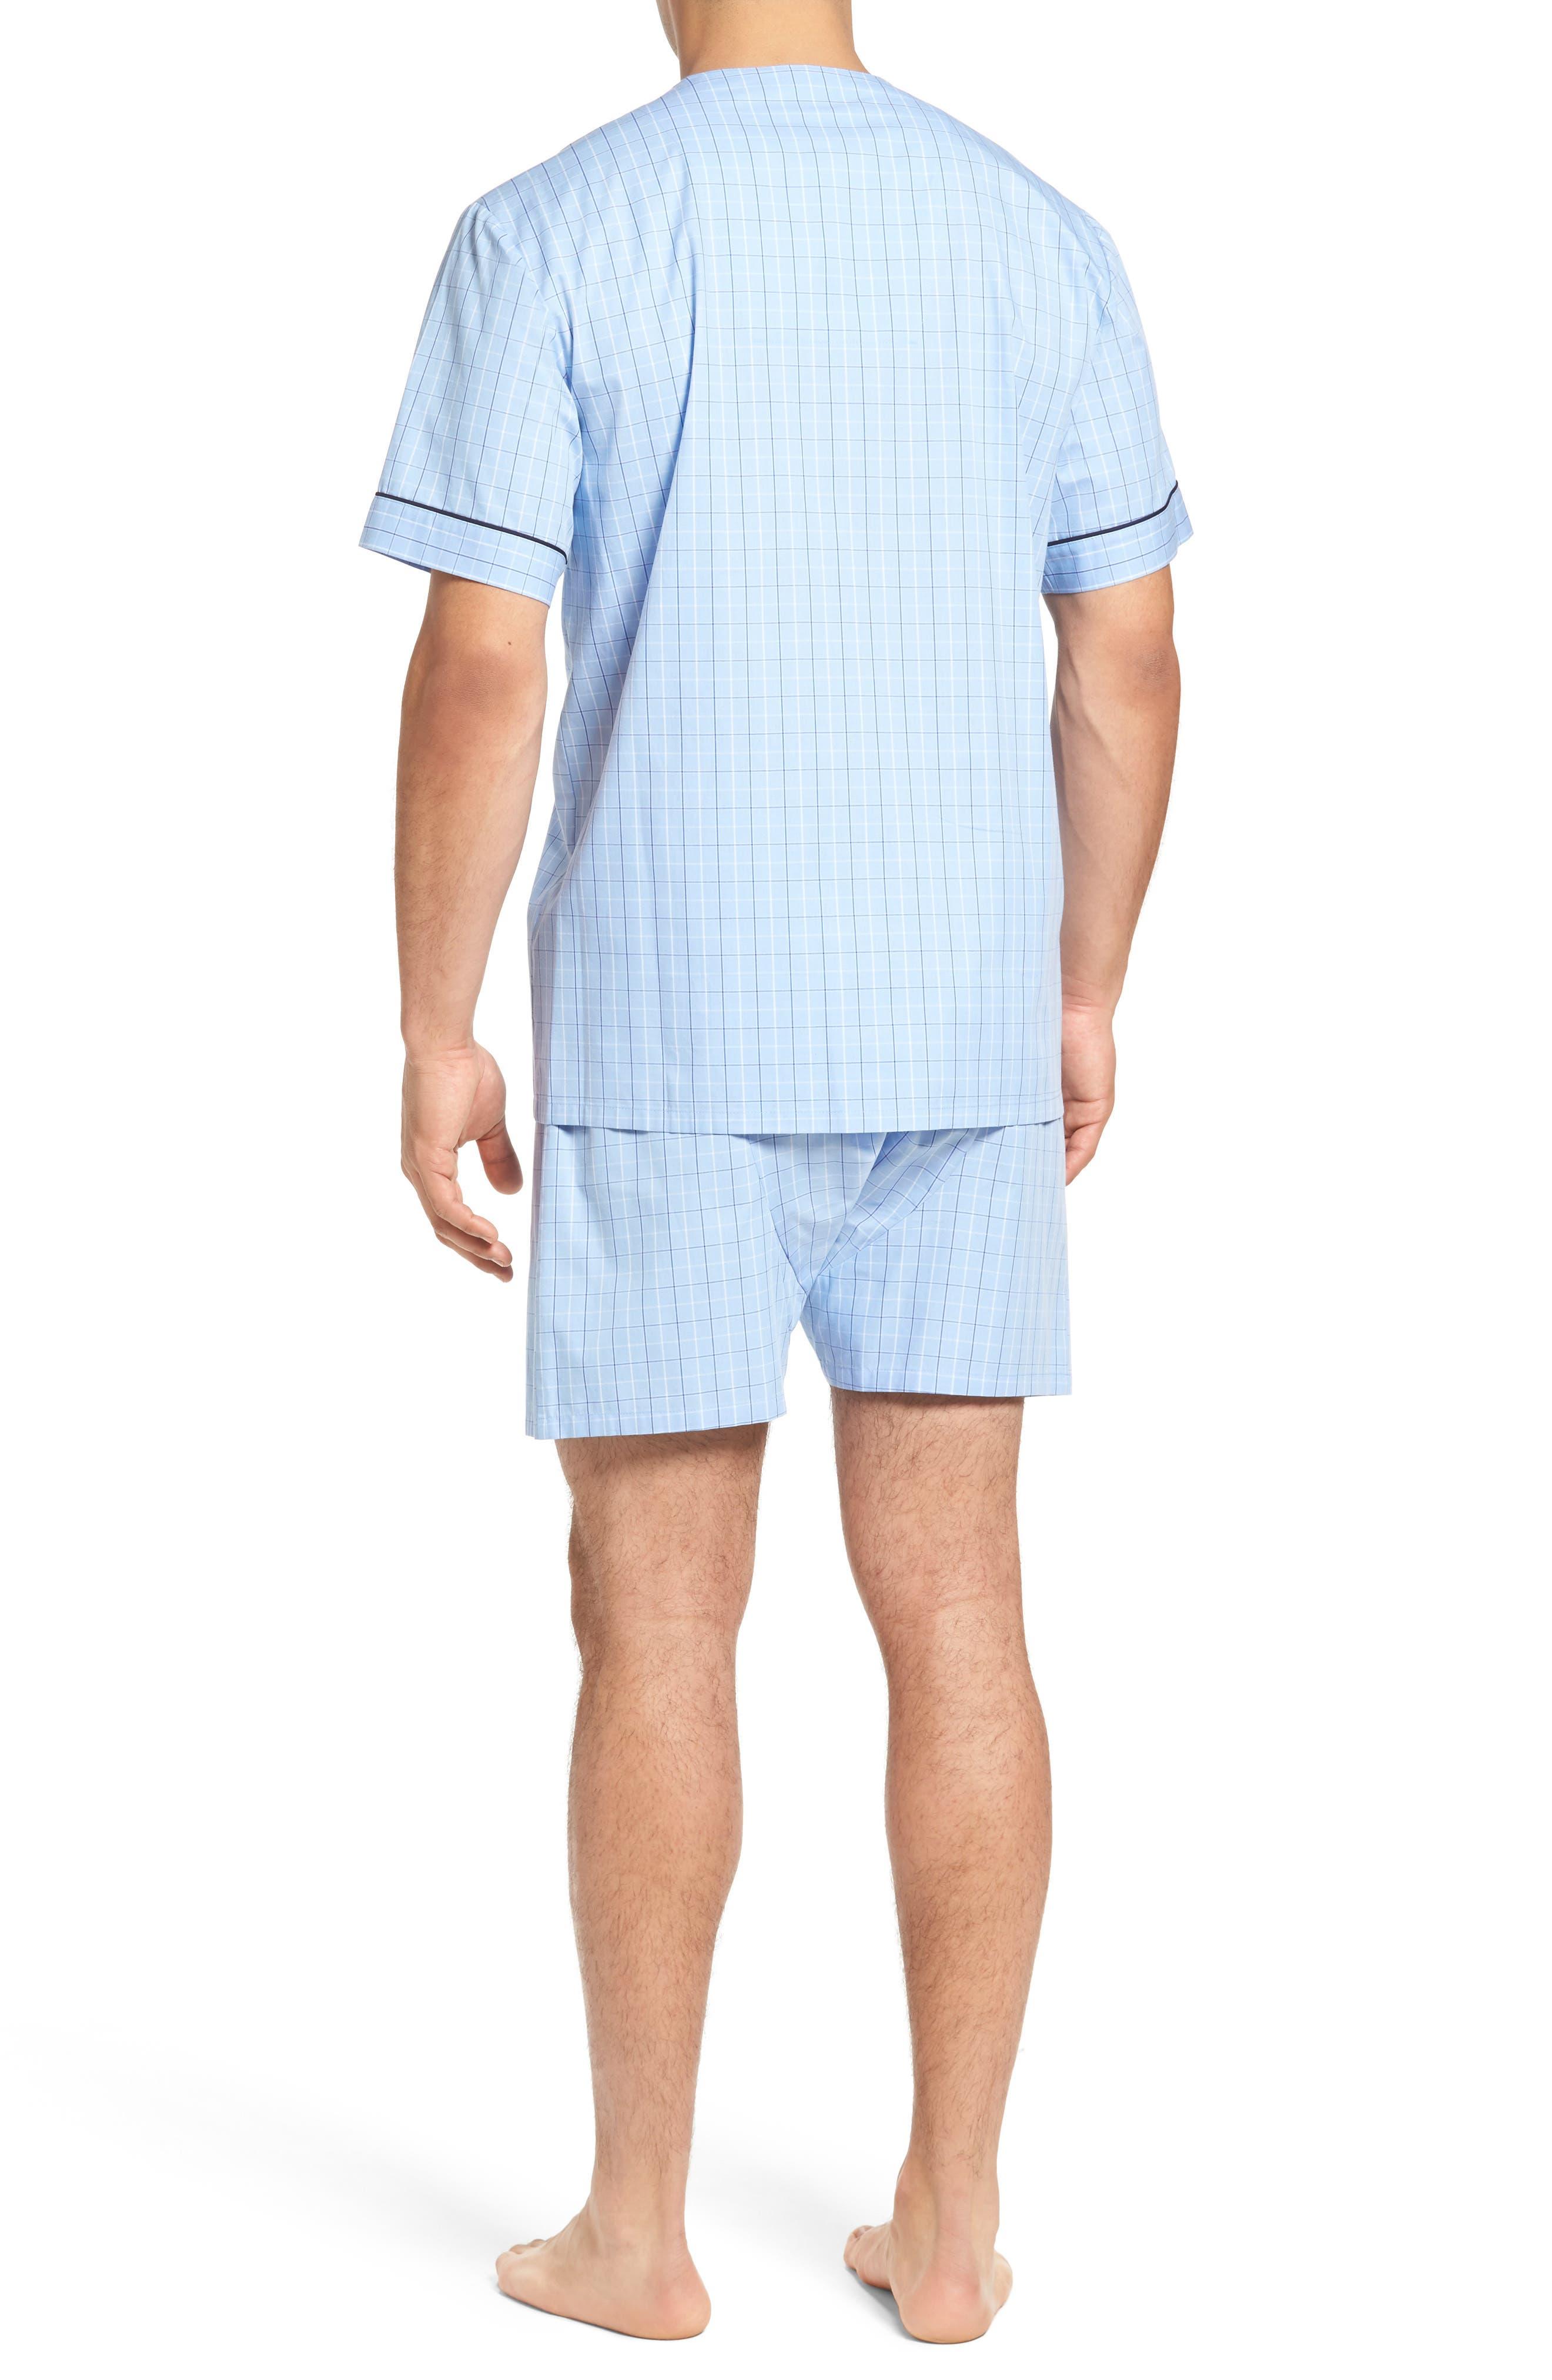 Cotton Short Pajamas,                             Alternate thumbnail 2, color,                             Light Blue Check